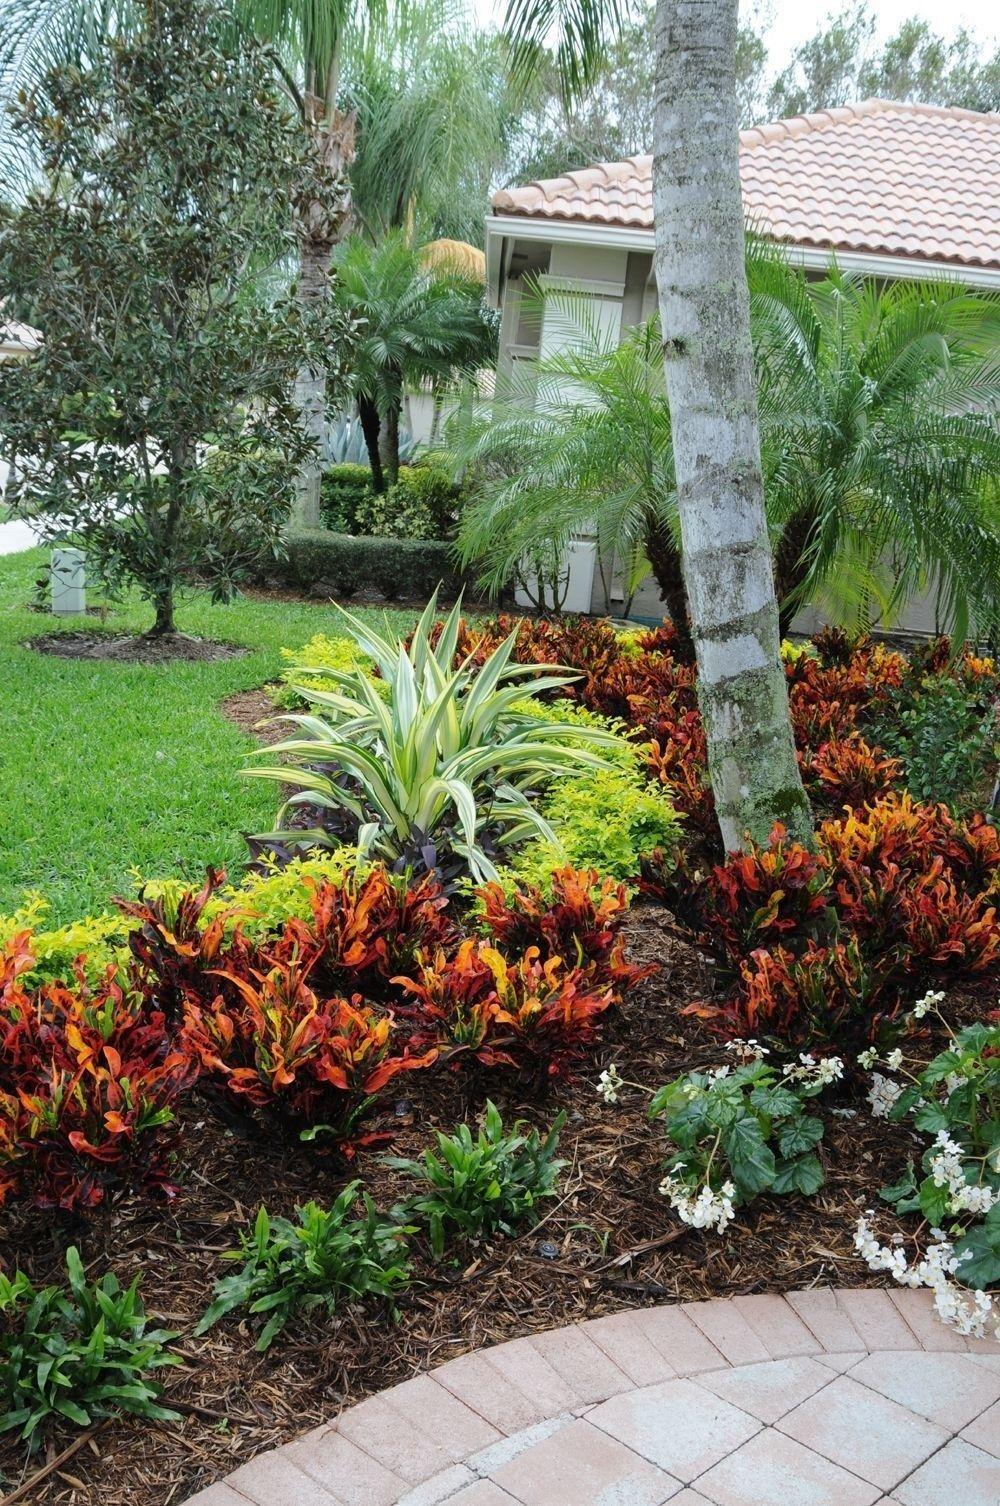 39 Tropical Plantation Ideas You Can Try in Your Garden #tropischelandschaftsgestaltung